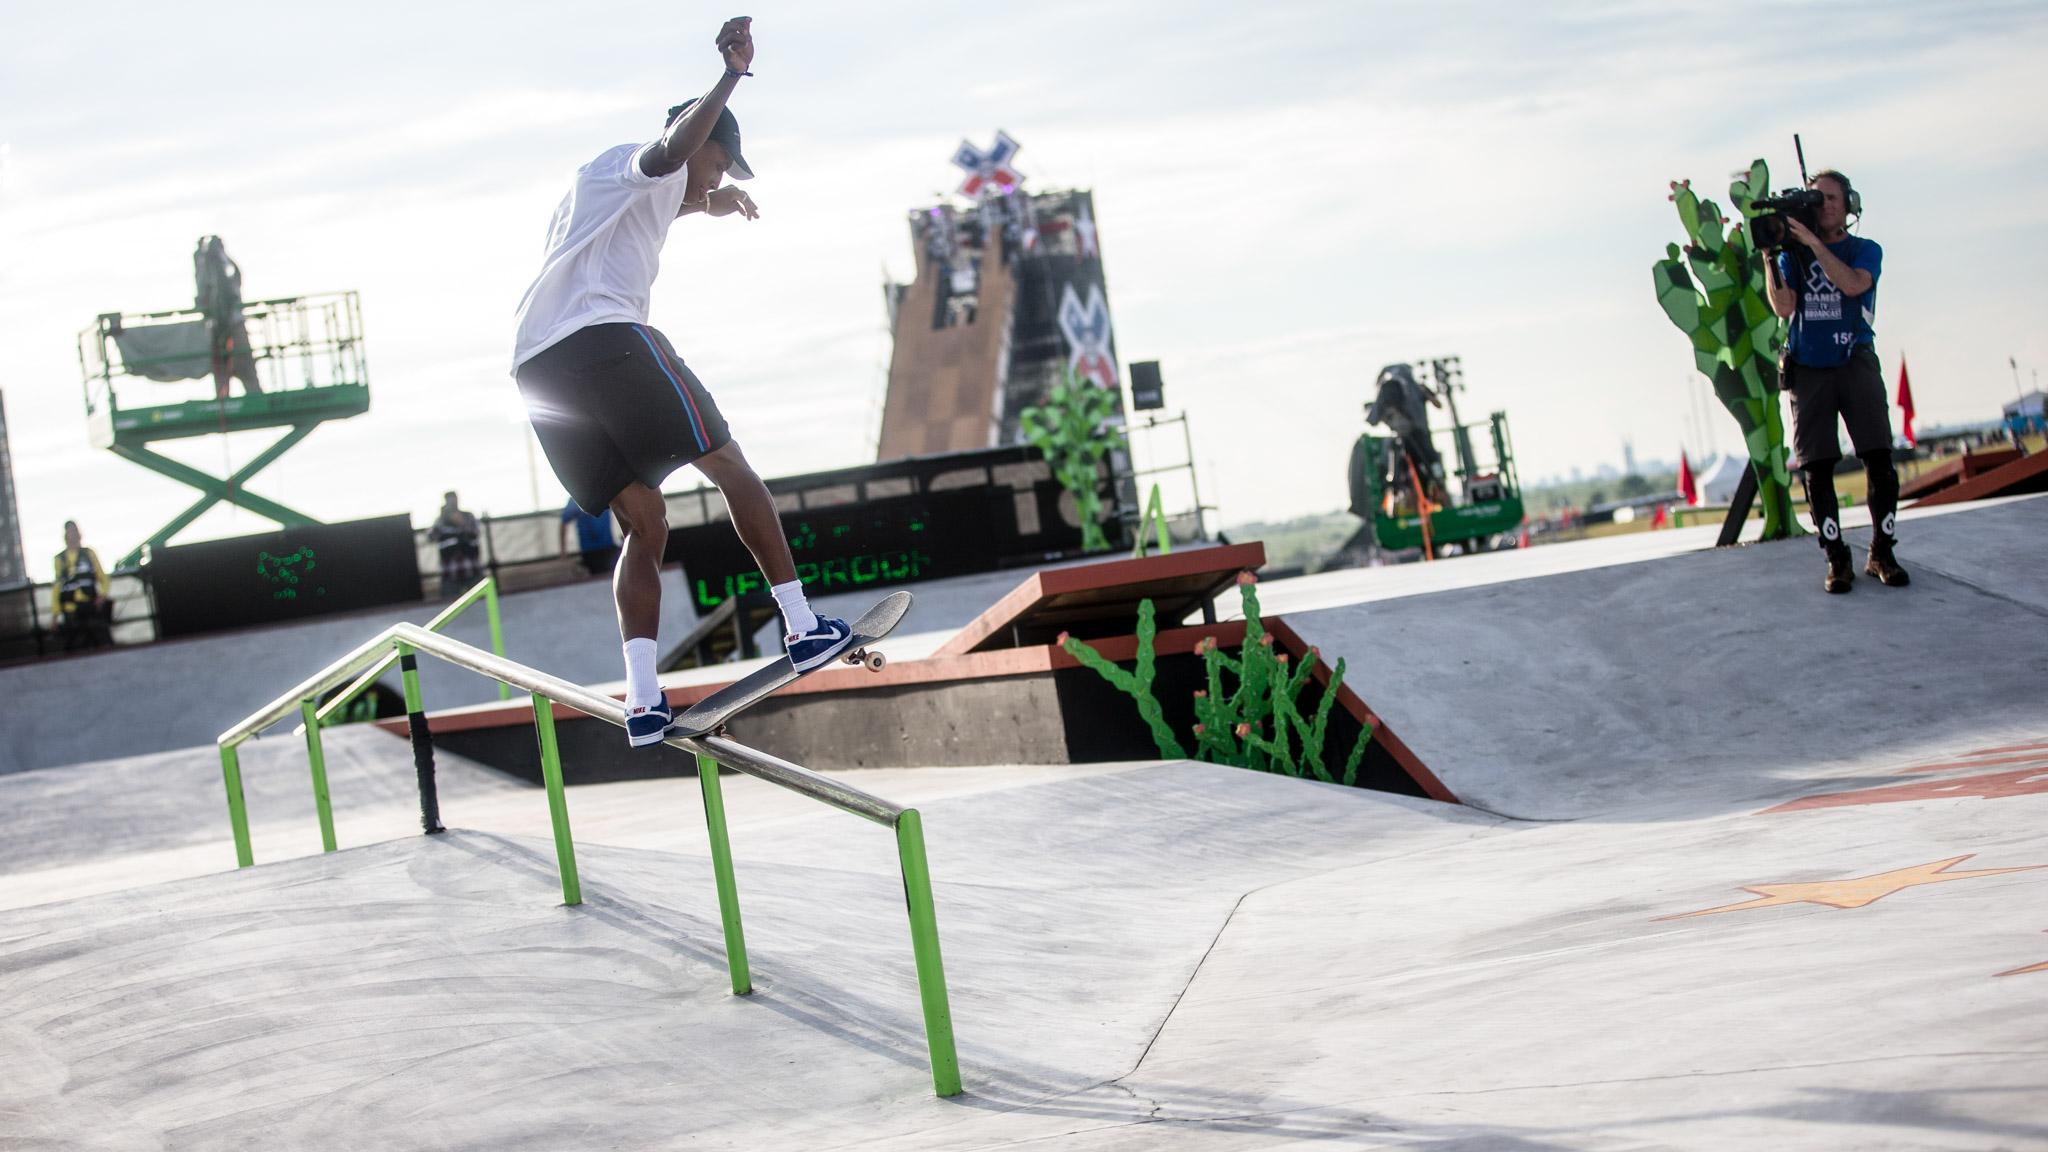 Ishod Wair: Skateboard Street